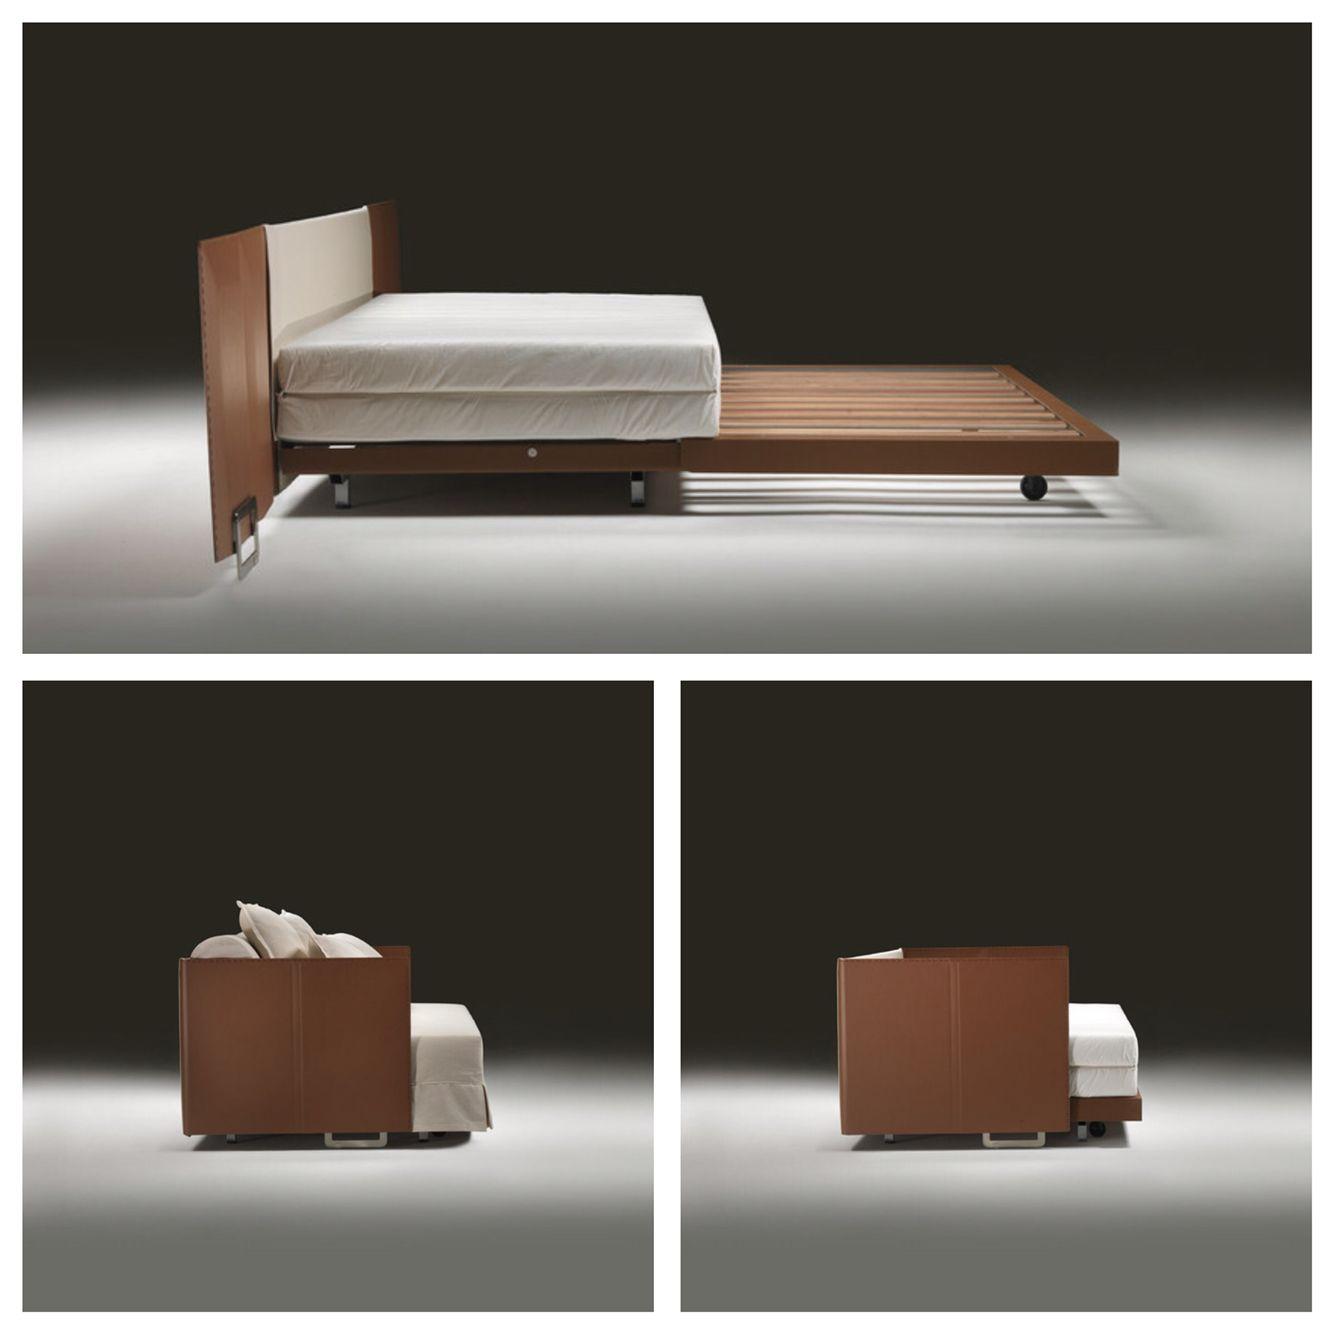 Flexform Made In Italy Eden Sofa Bed Project By Antonio Citterio Piso18casa Flexform Masaryk Flexform Luxury Luxurylifestyle Qualitybrand Beautifulli